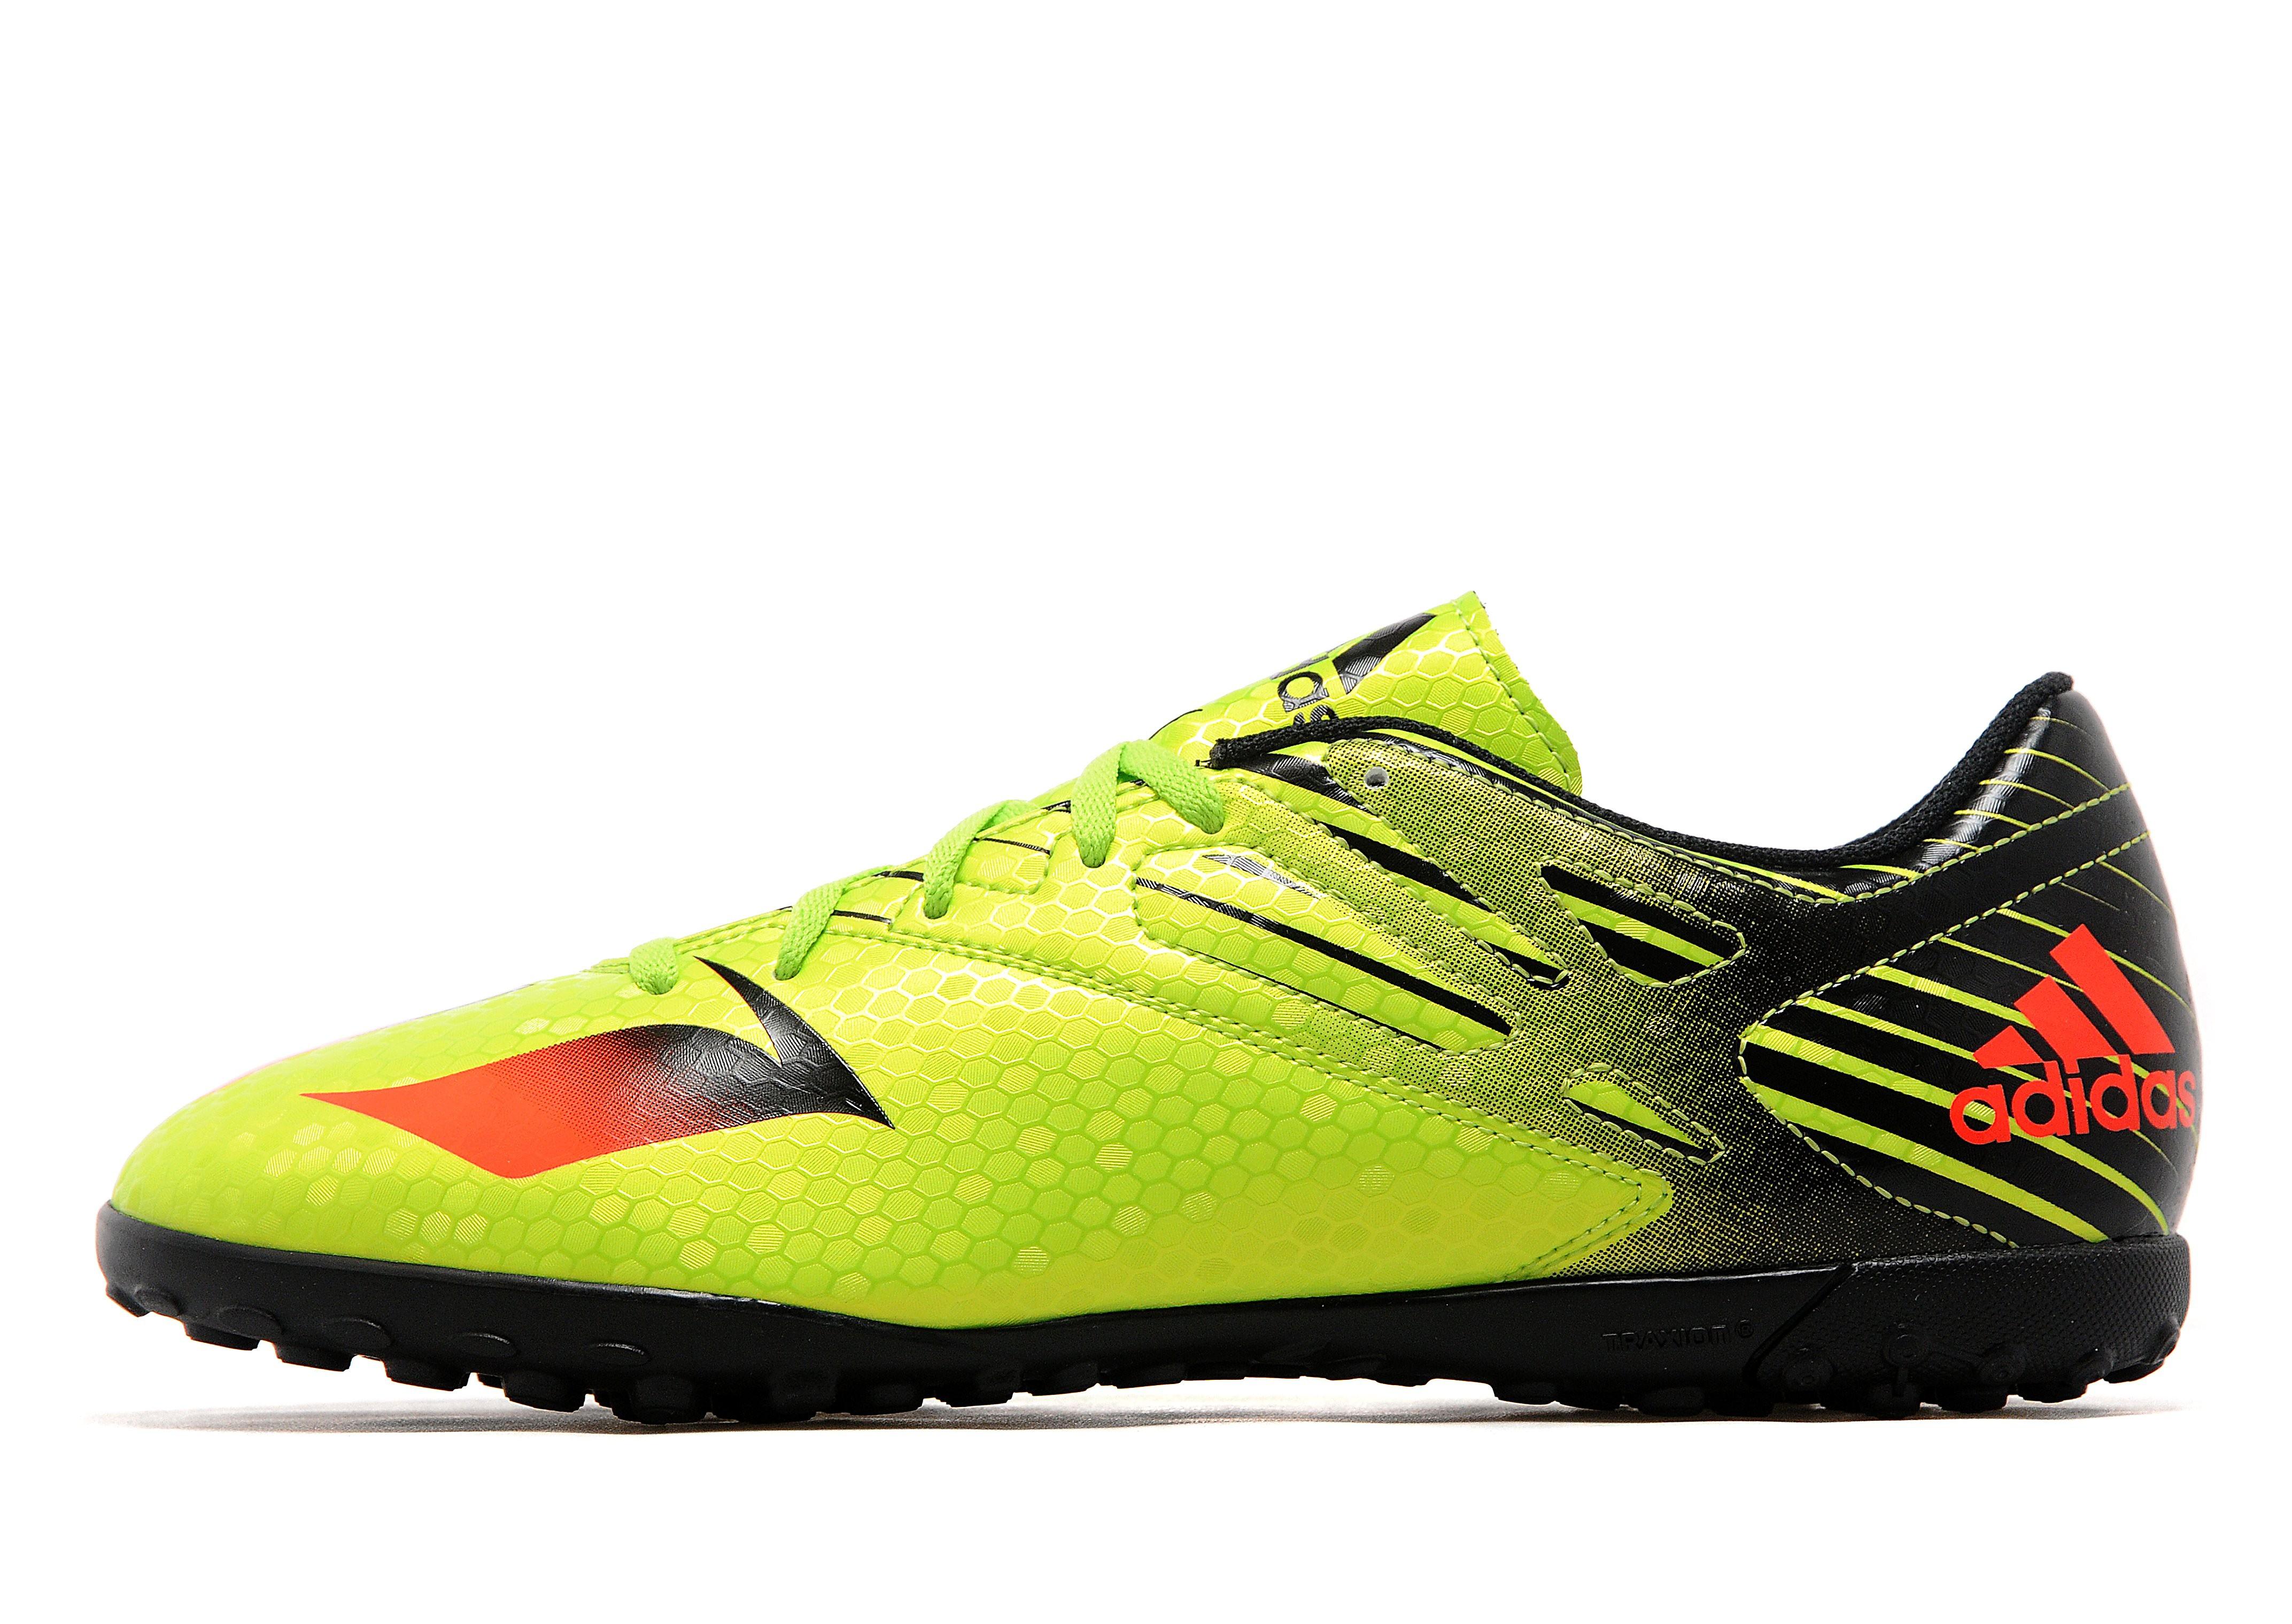 adidas Messi 15.4 Turf